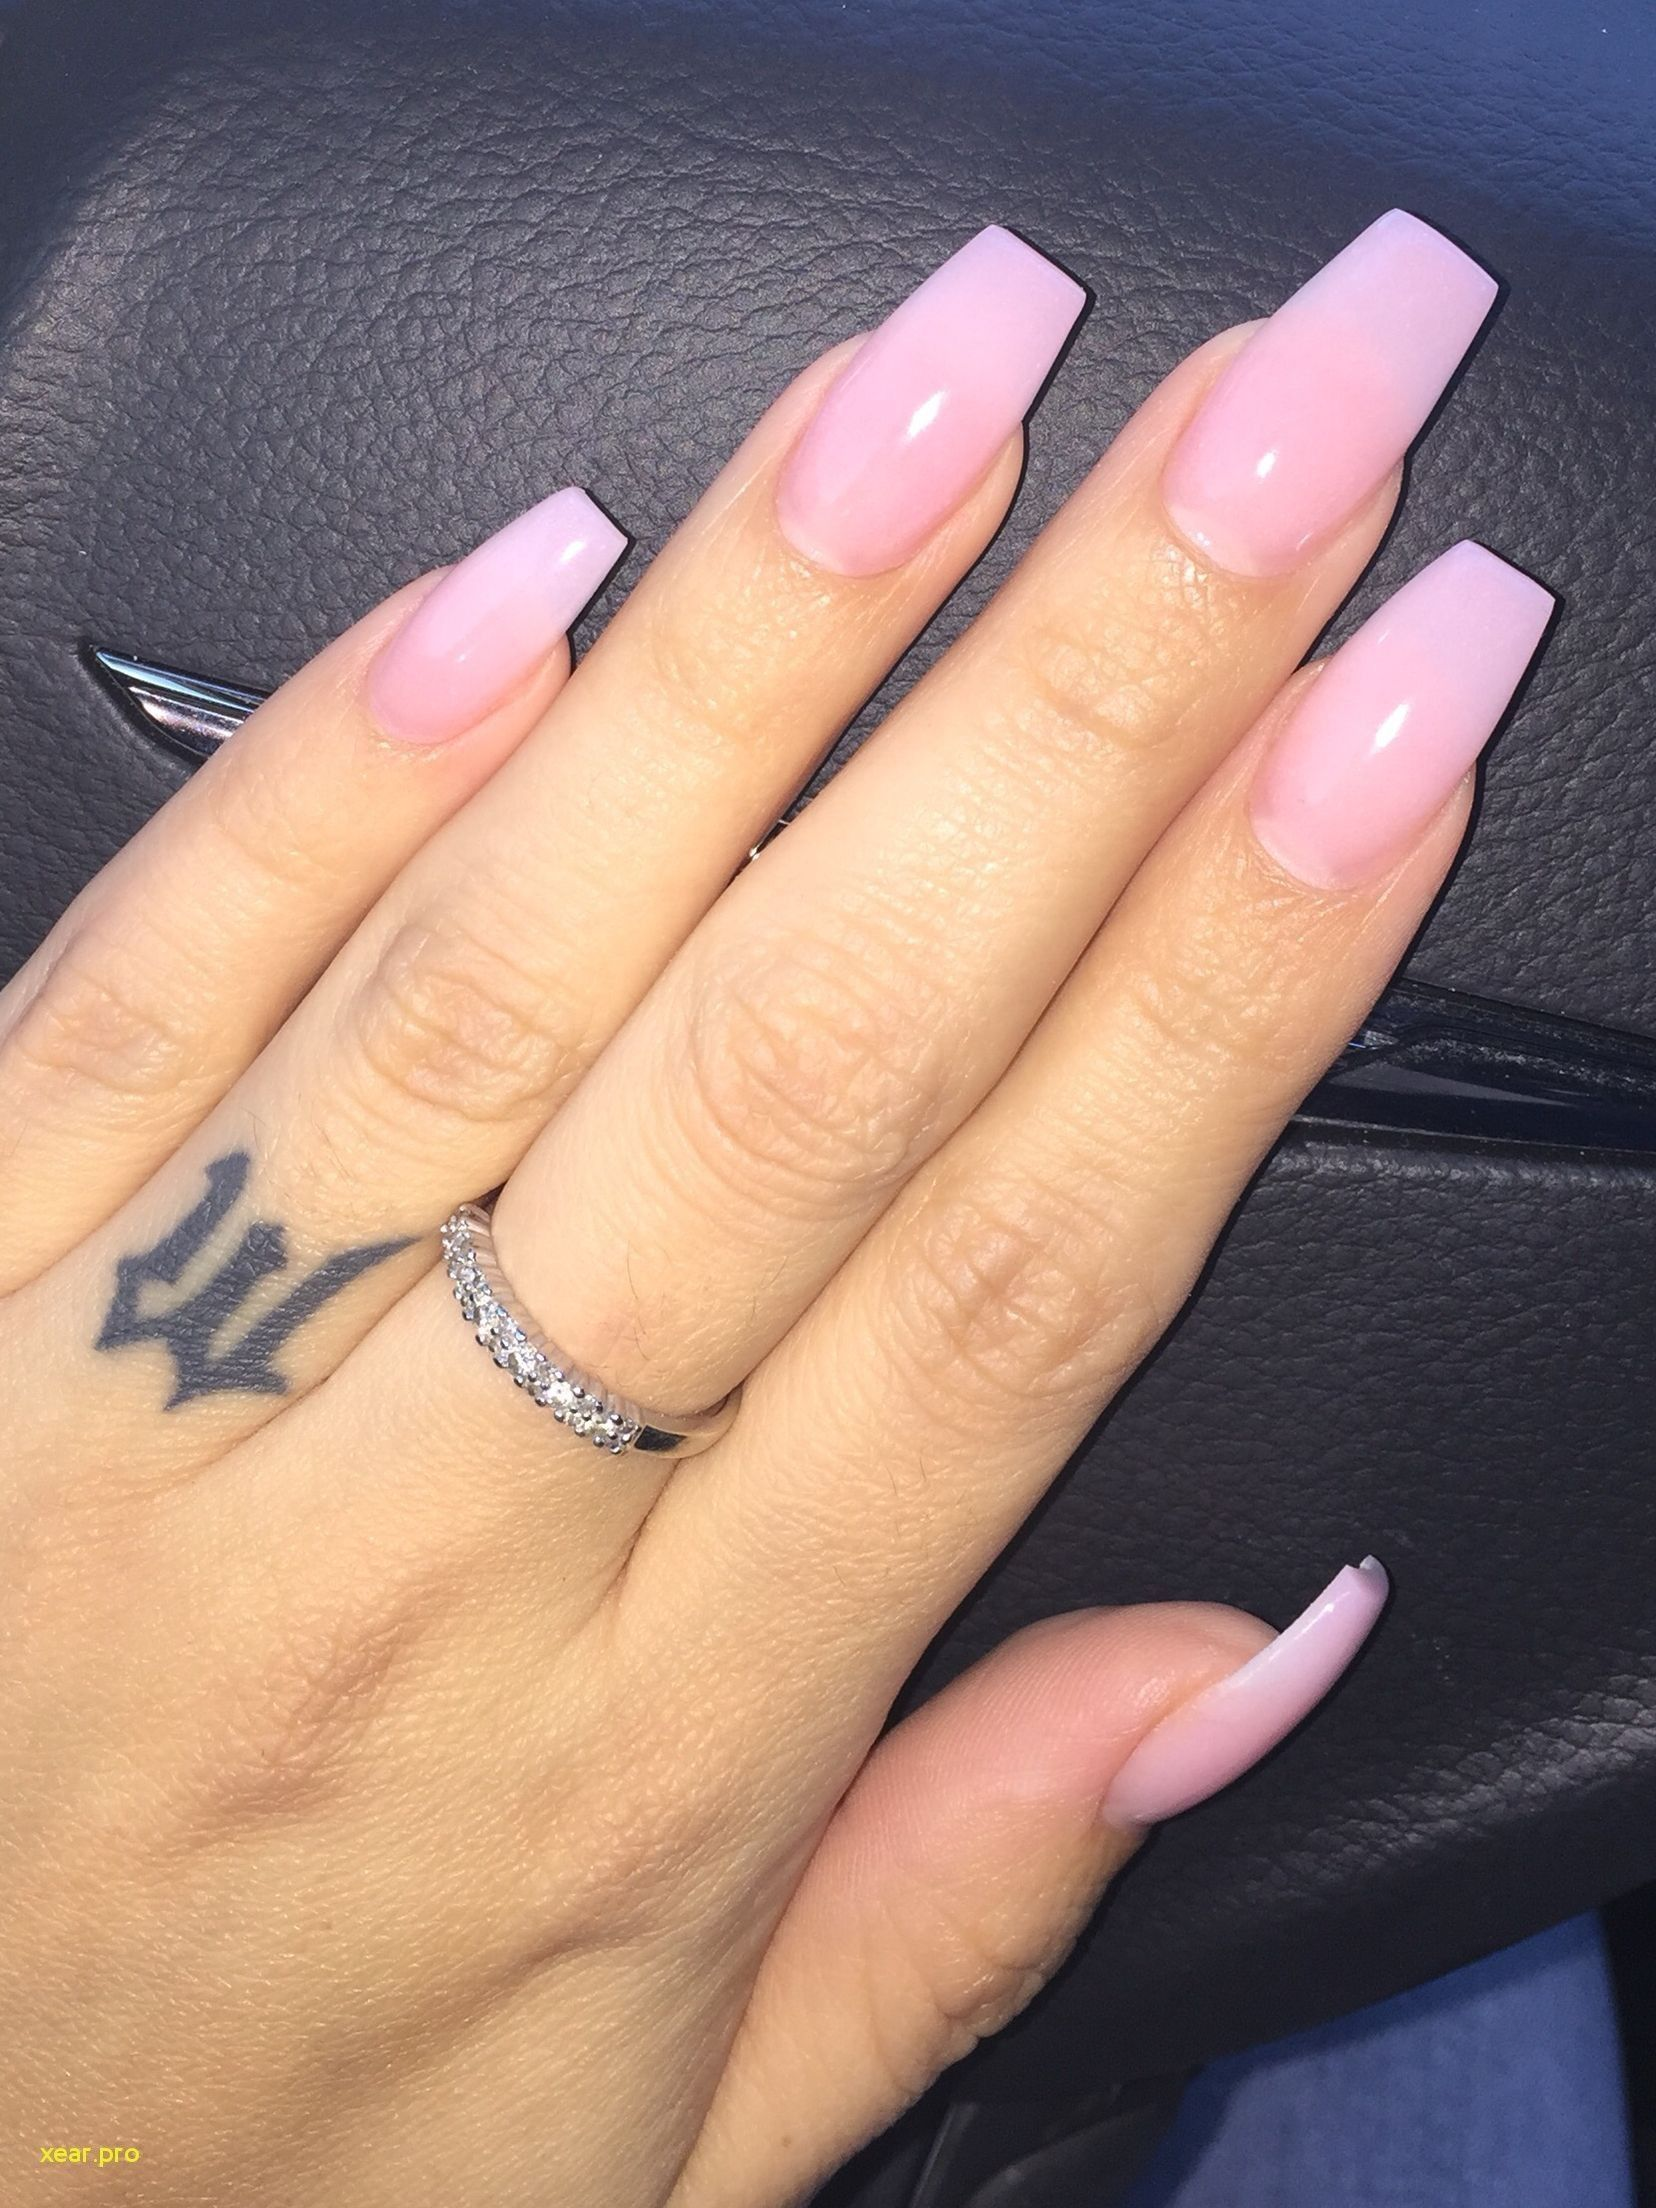 Clear Acrylic Nails Powder Mia Secret Pink Clear Acrylic Nail Powder Kolinsky Brush 3dmia Acrylic Nail Powder Pink Acrylic Nails Light Pink Acrylic Nails